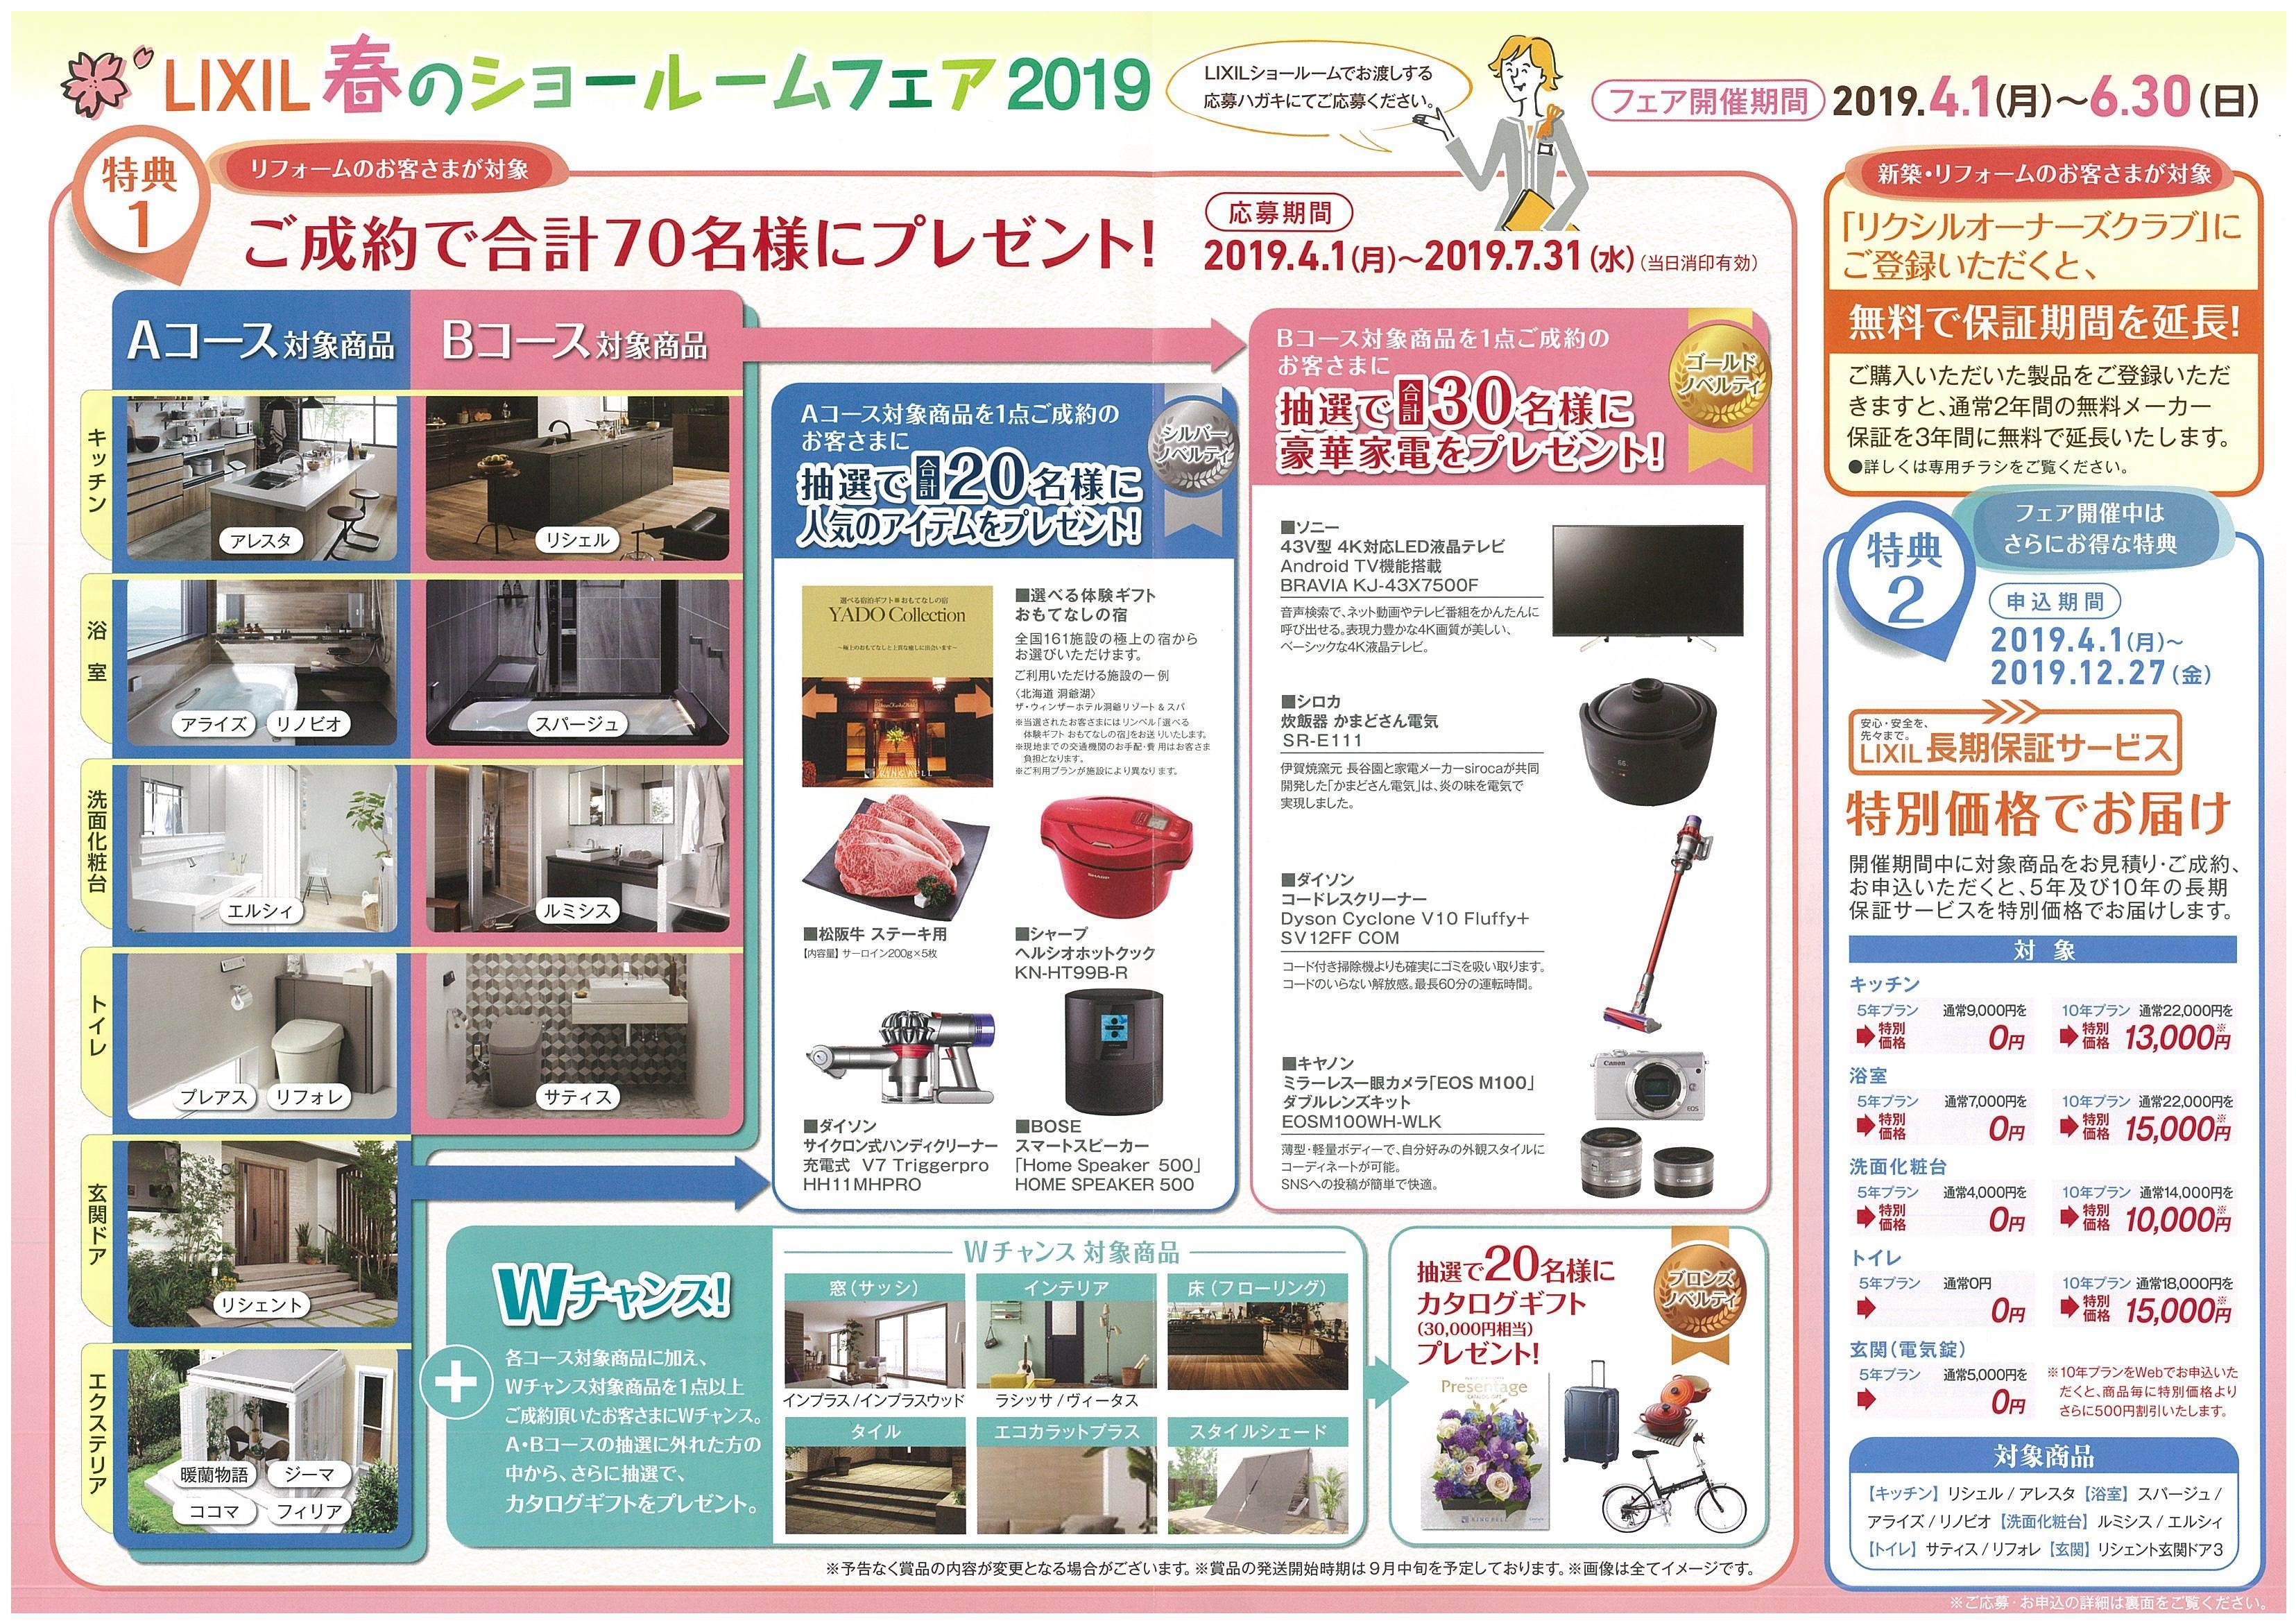 https://lixil-reformshop.jp/shop/SC00021006/photos/20190404142014-0001.jpg